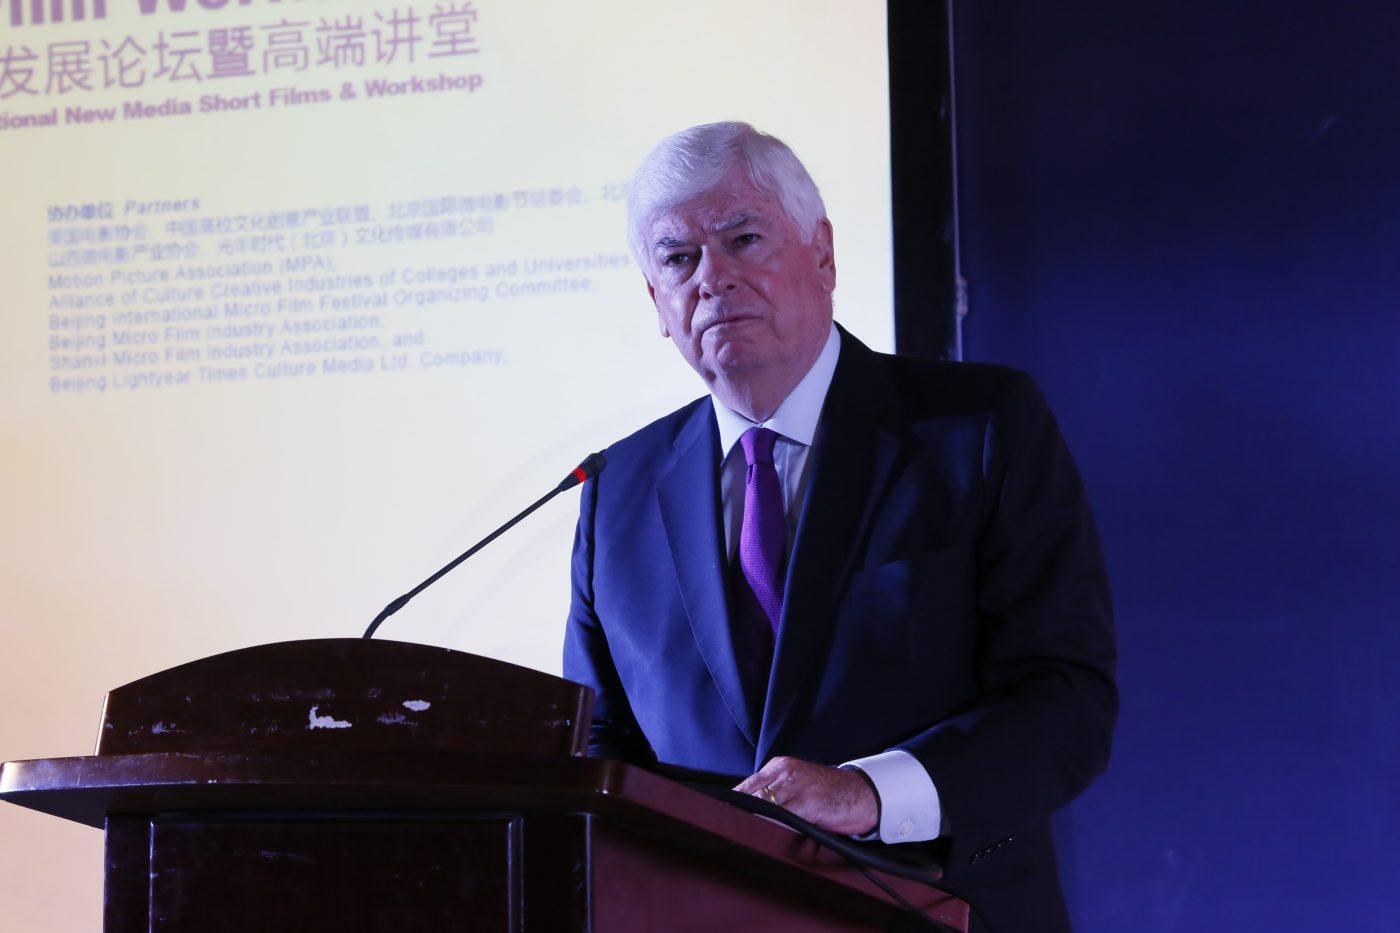 Chris-Dodd-in-China